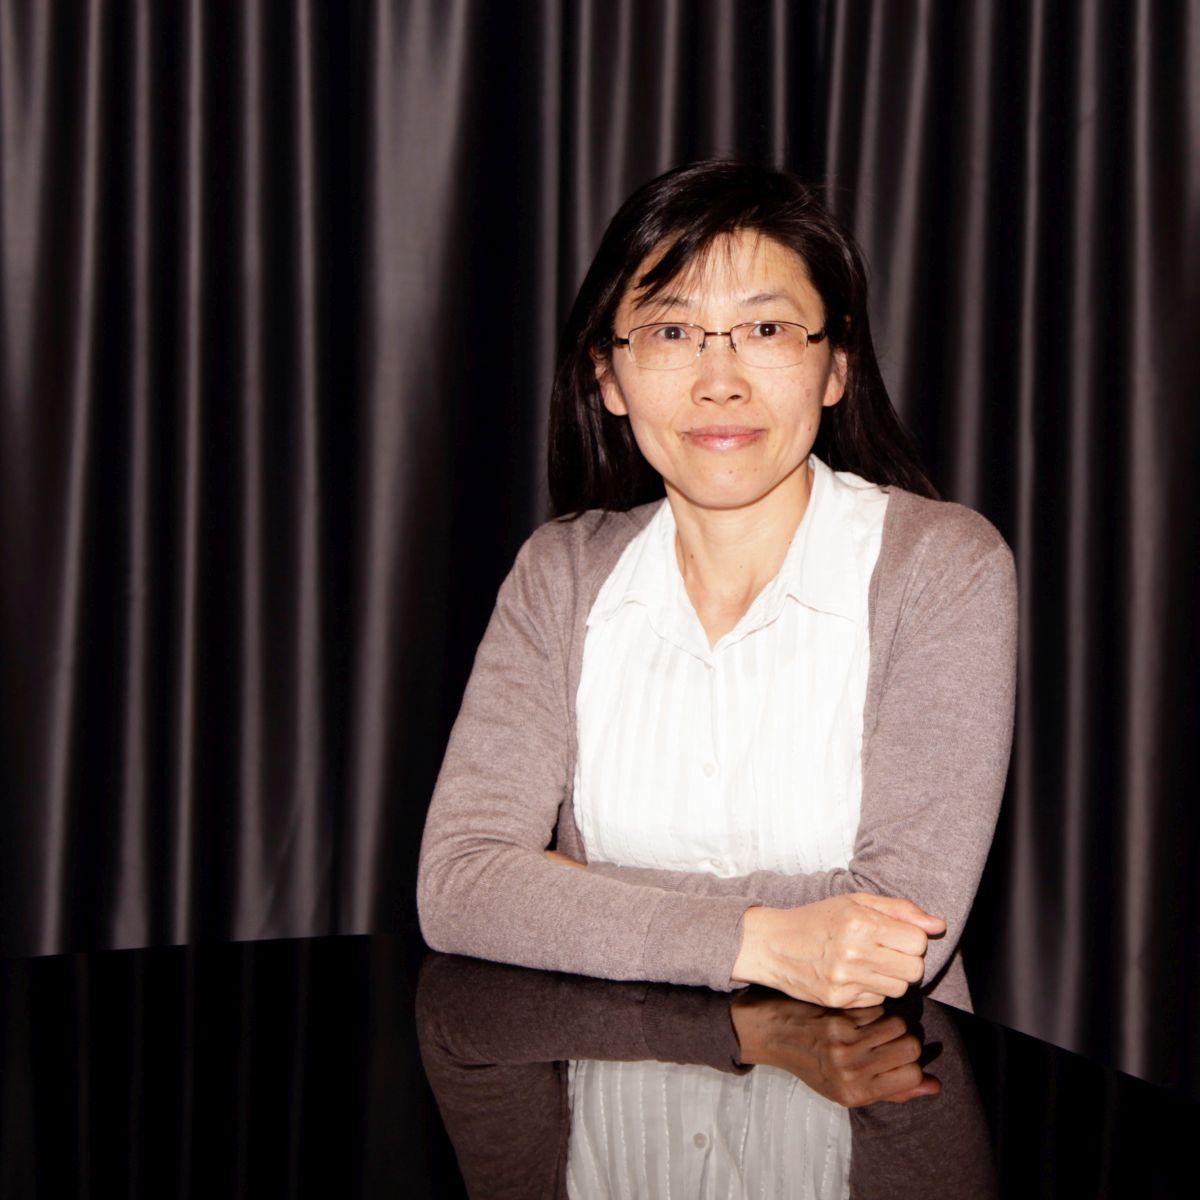 Bild von Ying-Yu Hertkorn